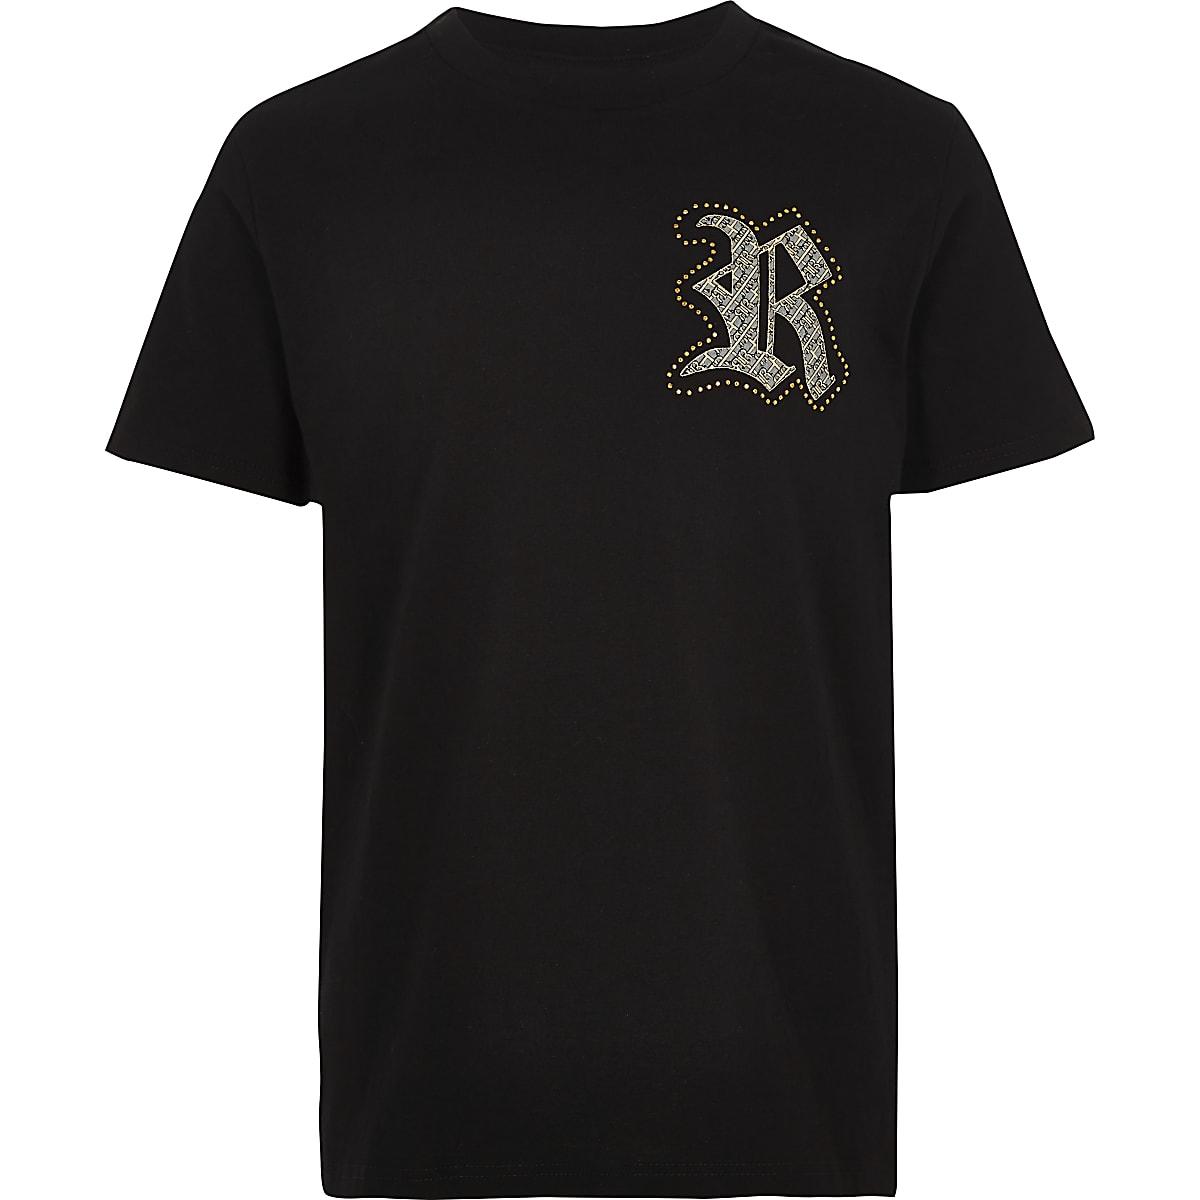 Boys black family twinning RI T-shirt